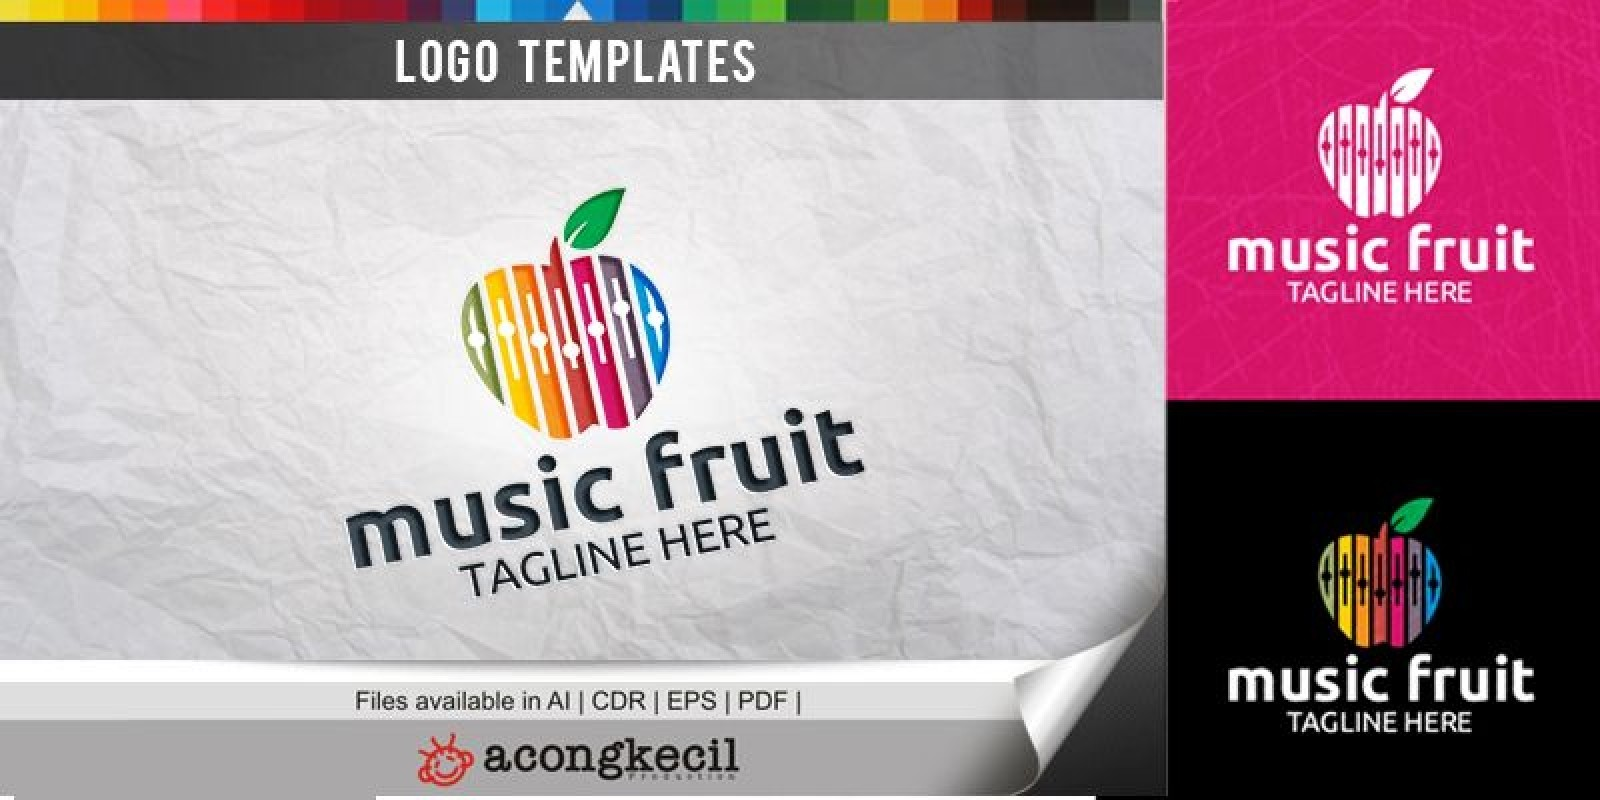 Music Fruit - Logo Template